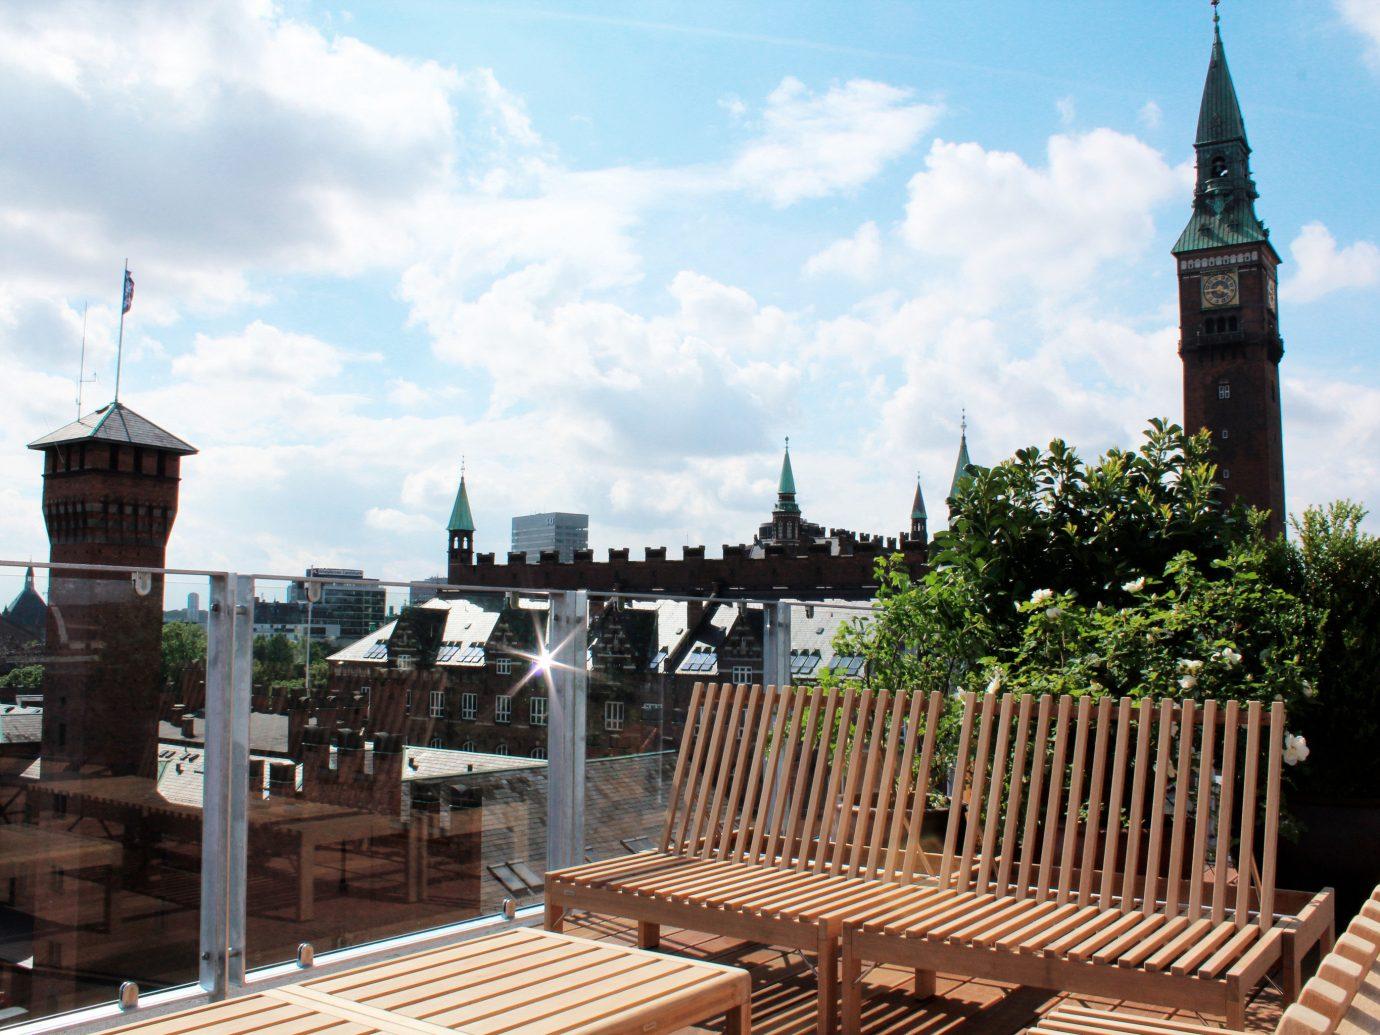 Boutique Hotels Copenhagen Denmark Hotels sky outdoor landmark outdoor structure tree roof City building spire plaza steeple day